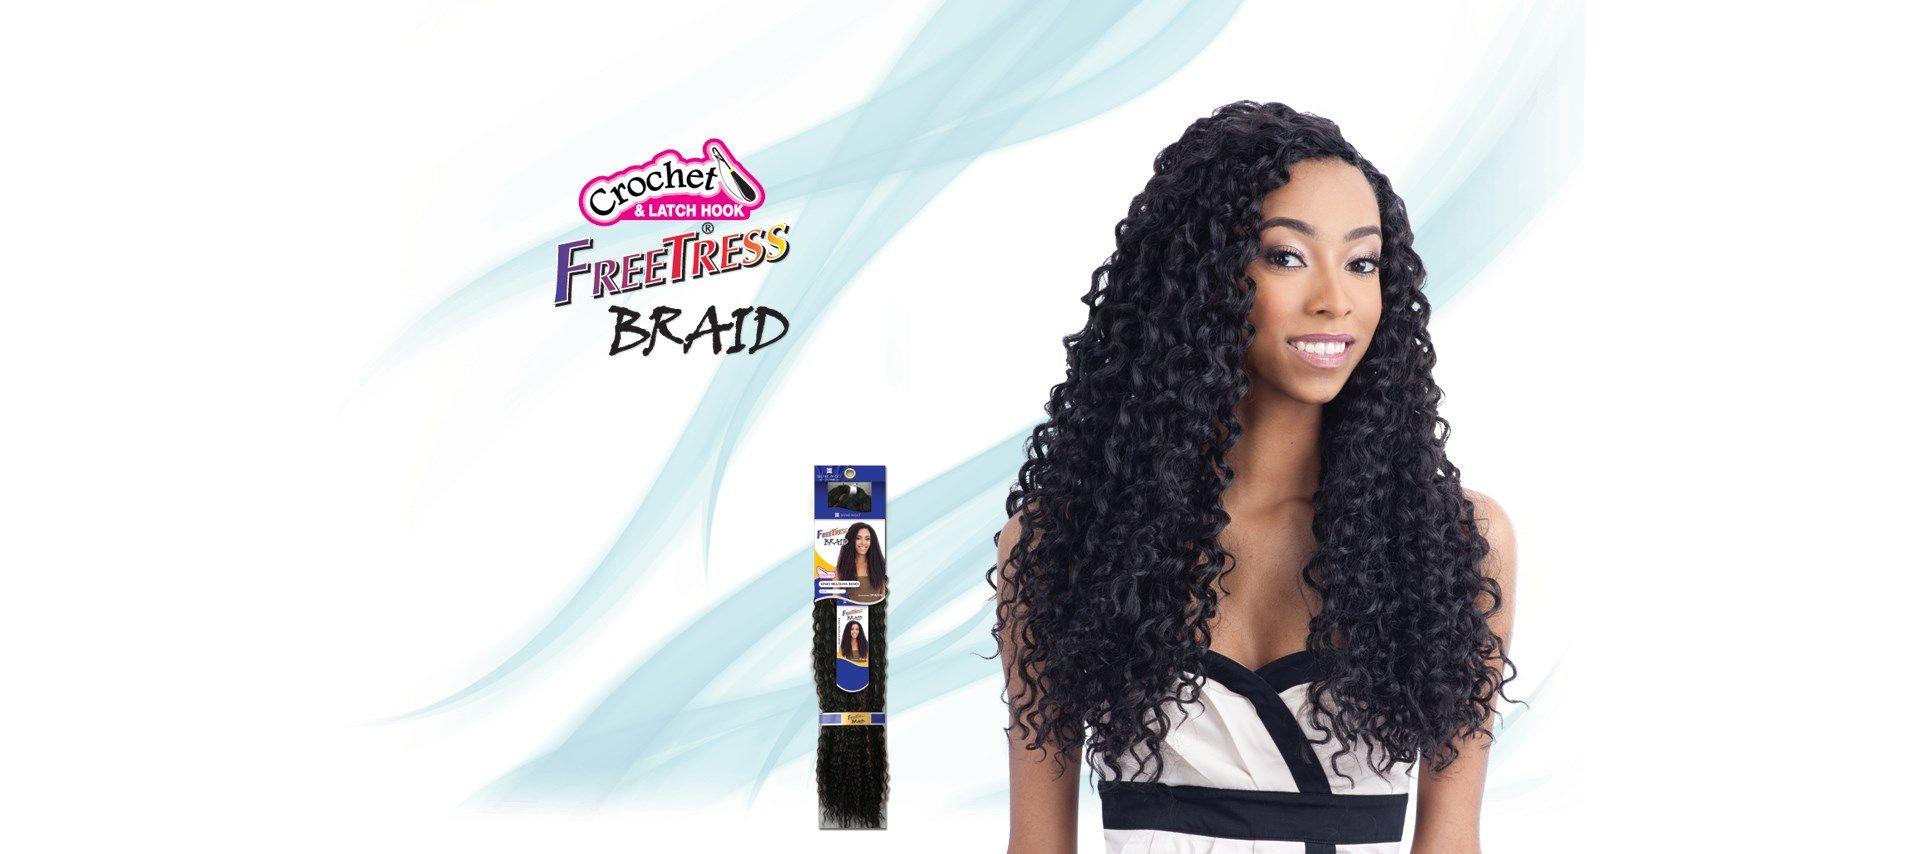 FREETRESS - Shake-N-Go Fashion, Inc.